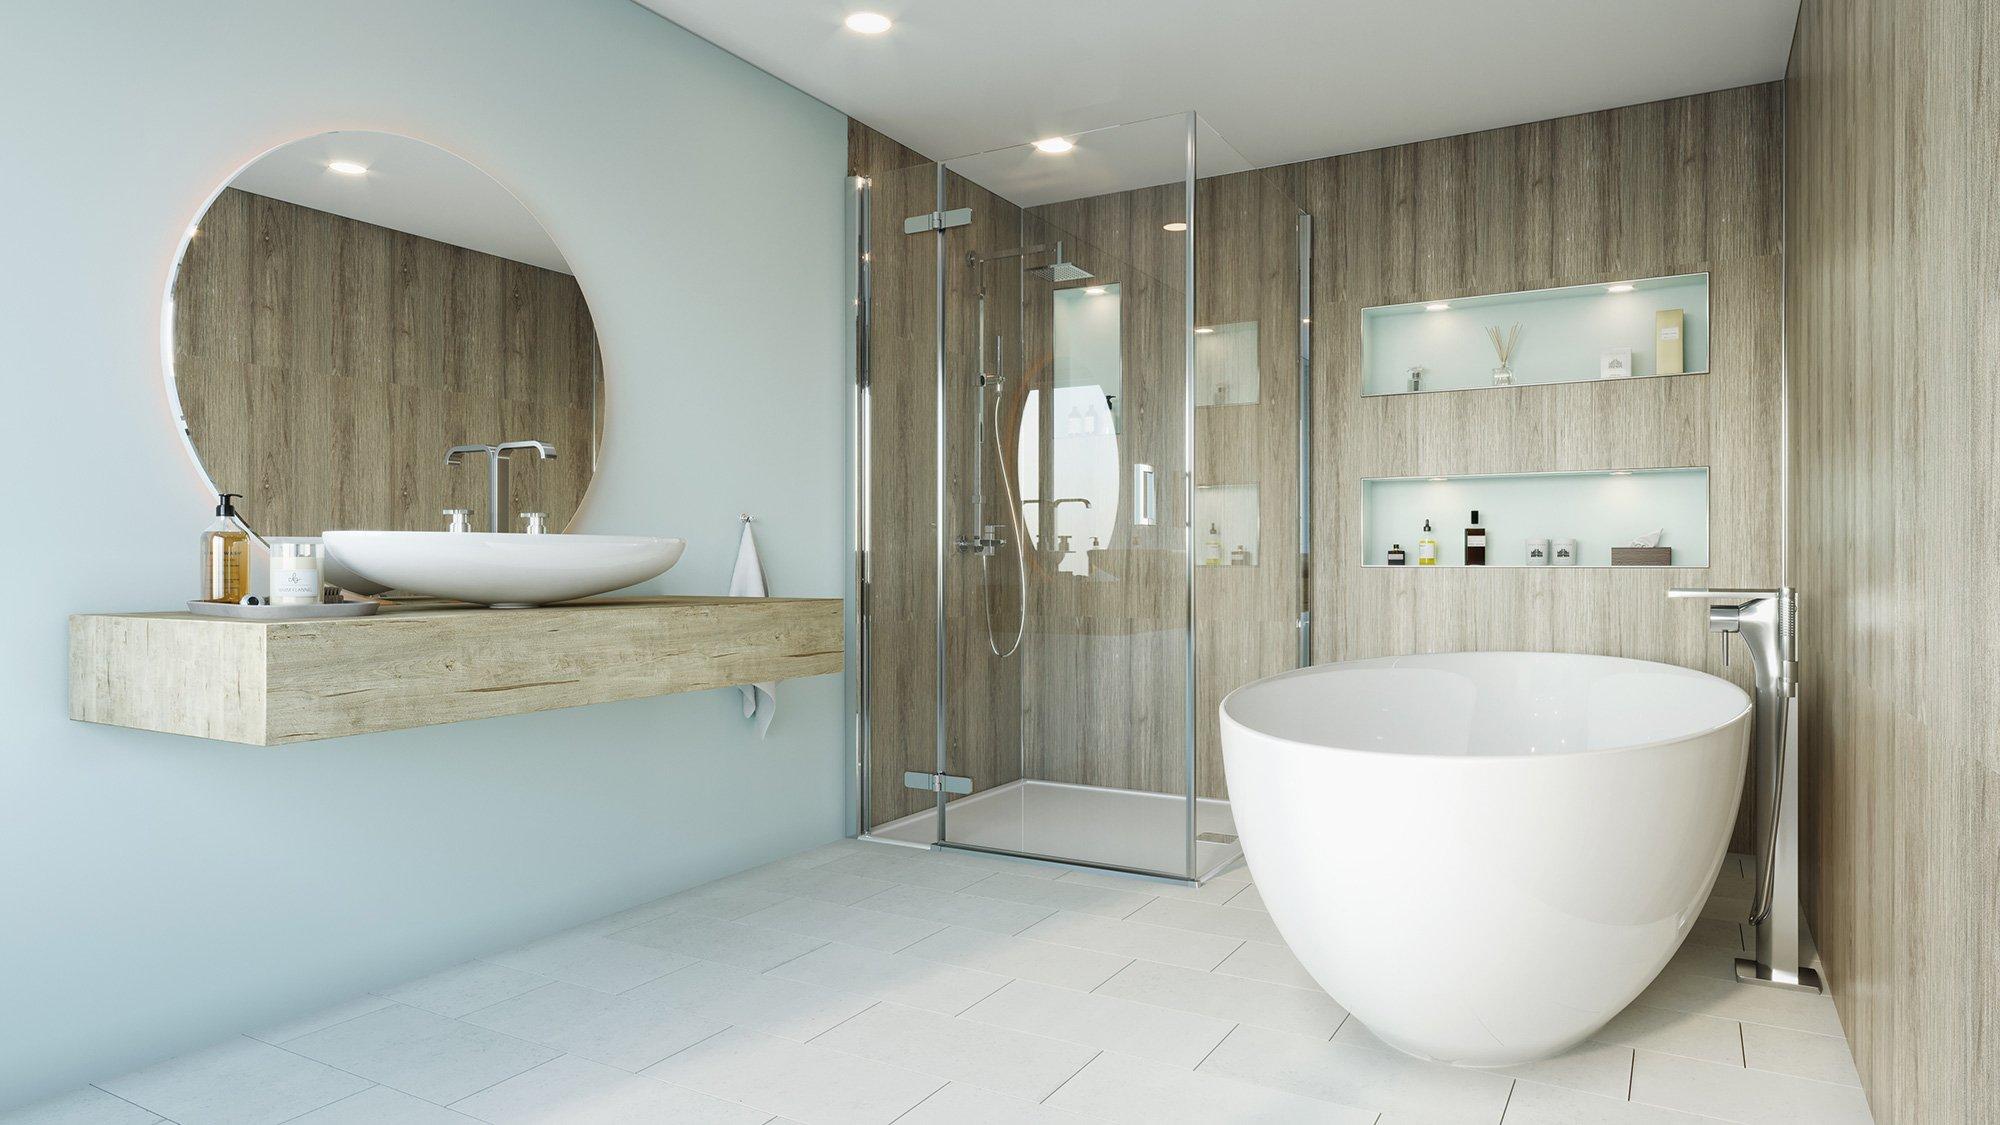 Delano Oak Bathroom Cladding Direct